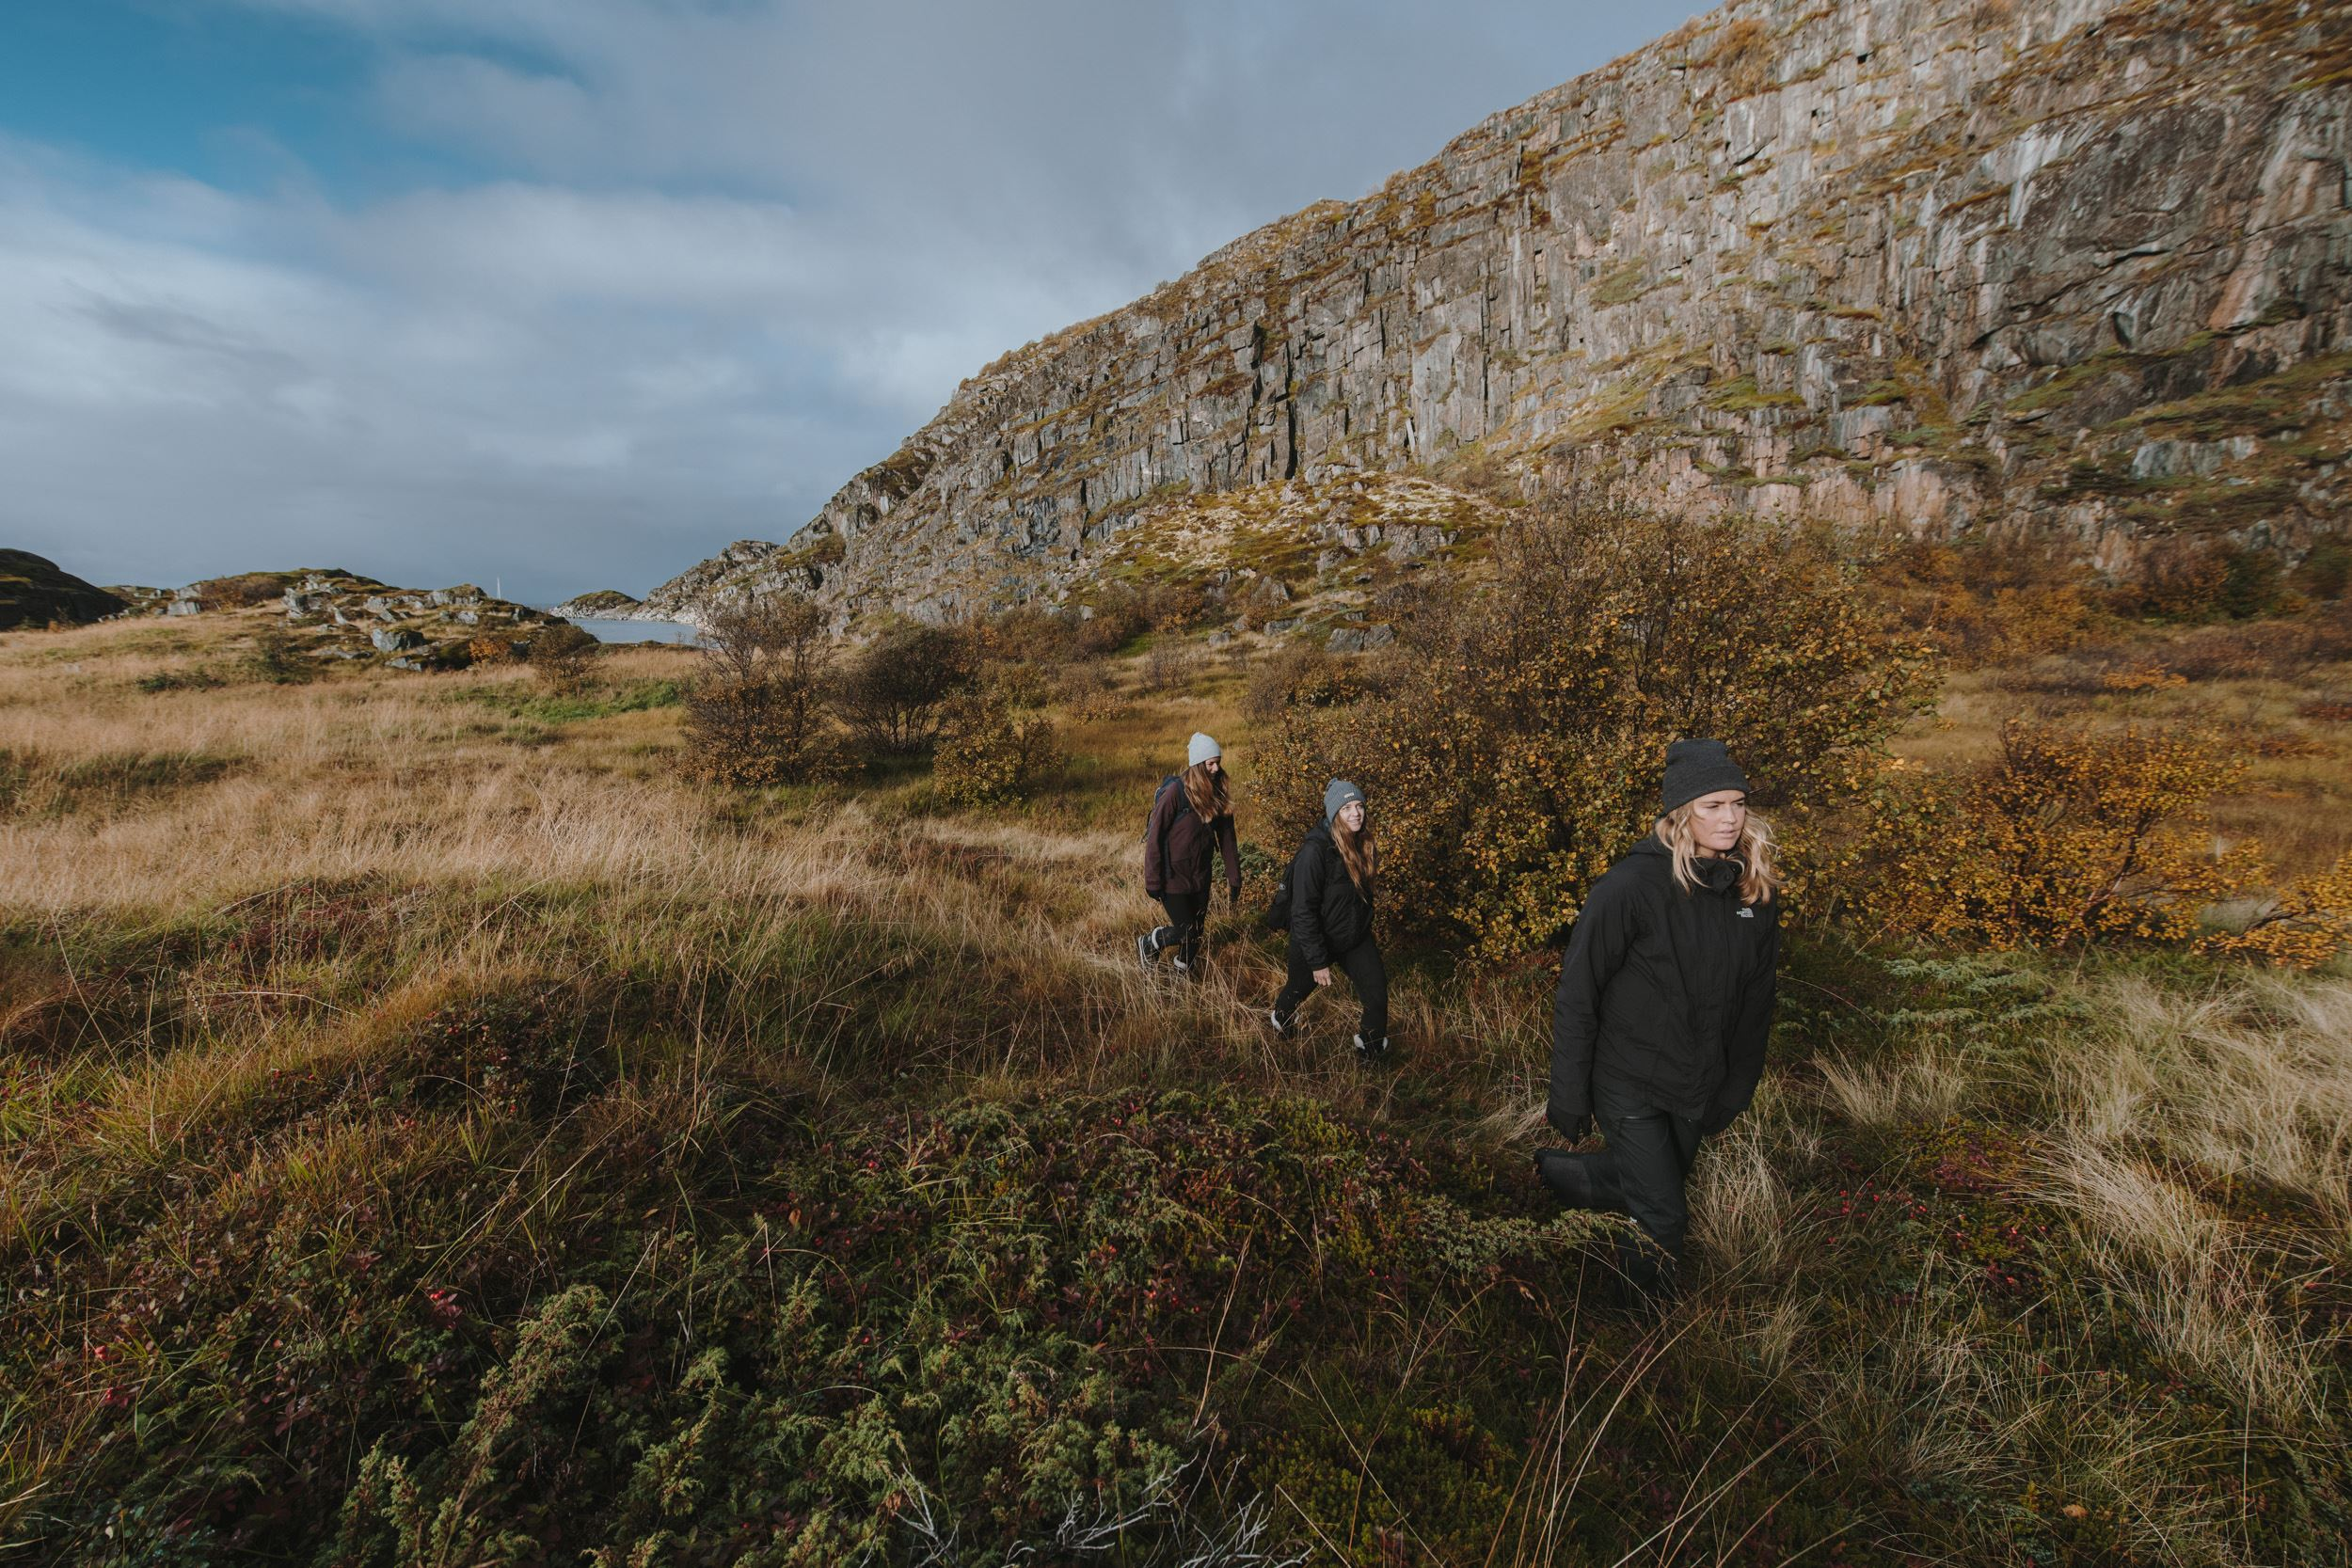 Scenic Hike & Fishing Village Tour to Henningsvær